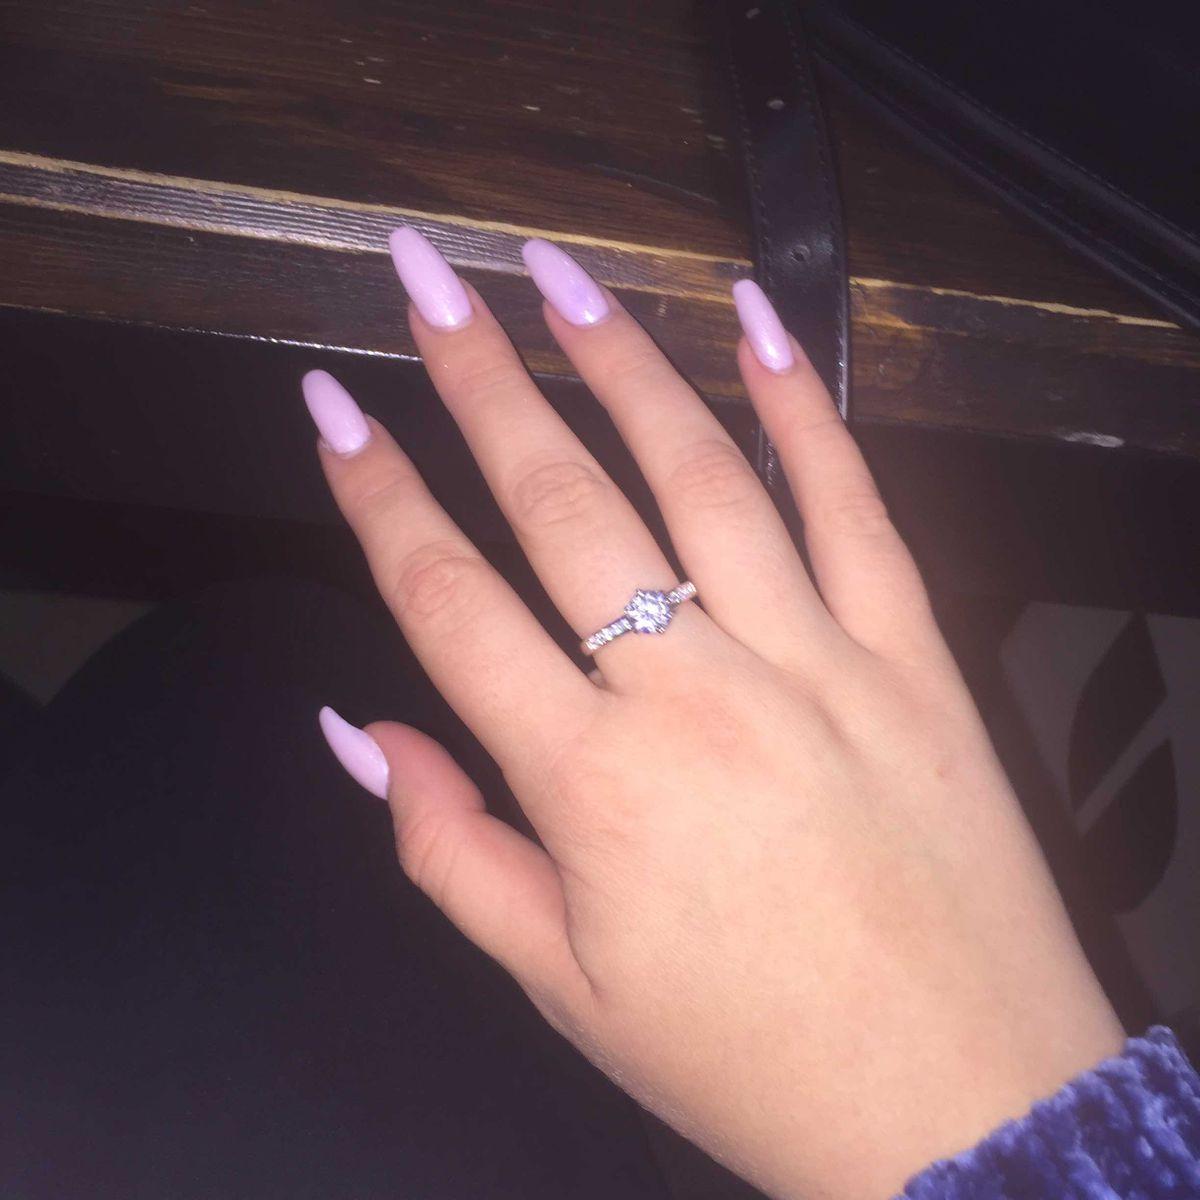 Супер кольцо за маленькую цену